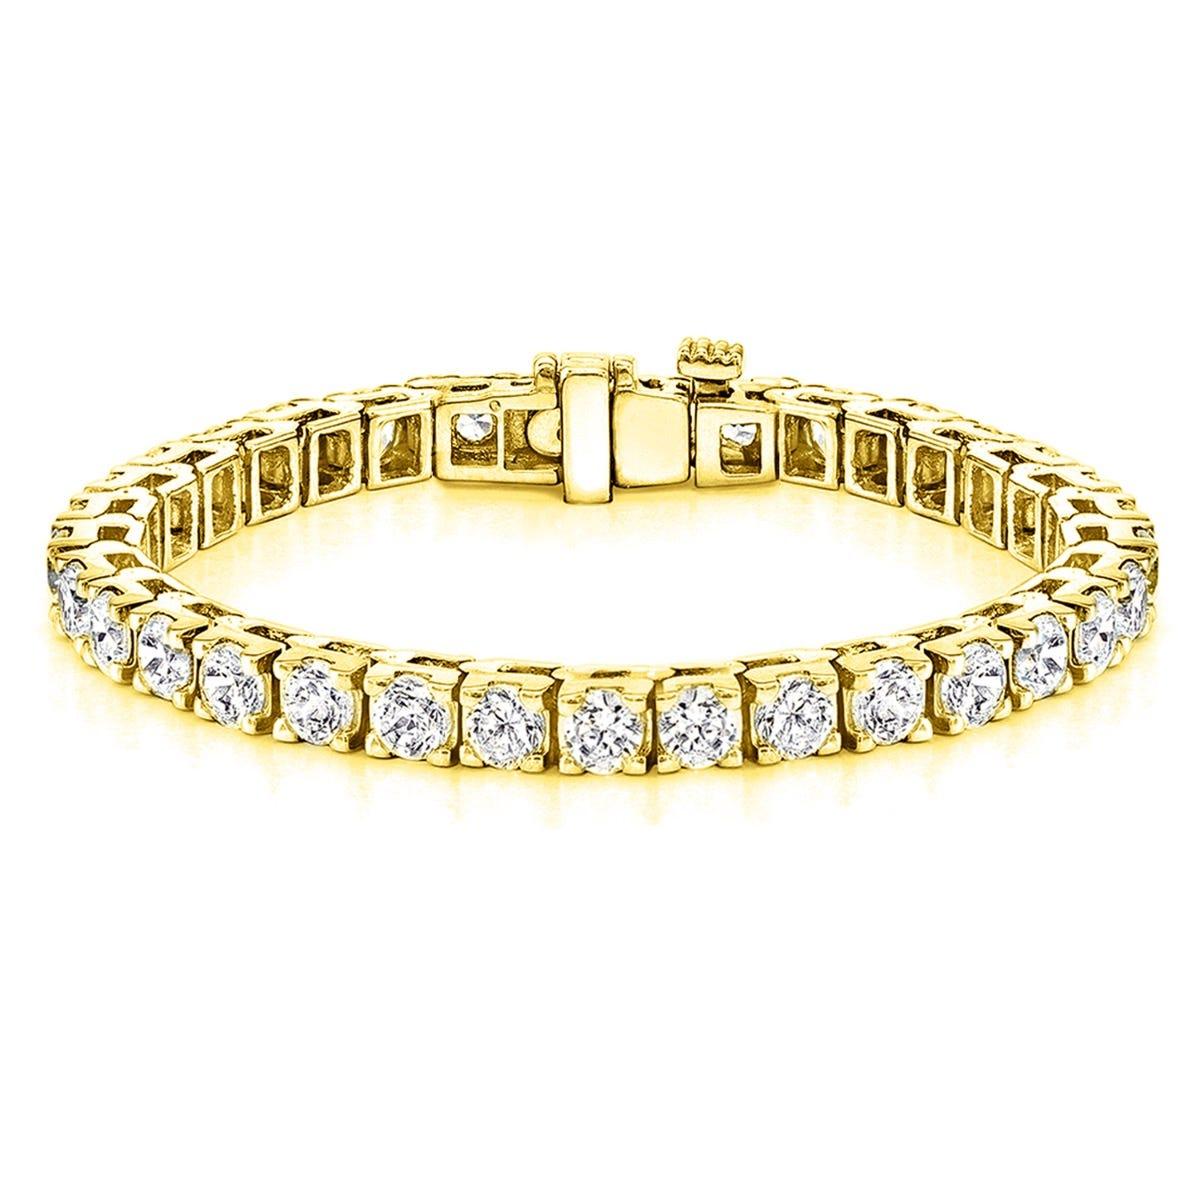 16.50ctw. 4-Prong Square Link Diamond Tennis Bracelet in 14K Yellow Gold (HI, VS1-VS2)